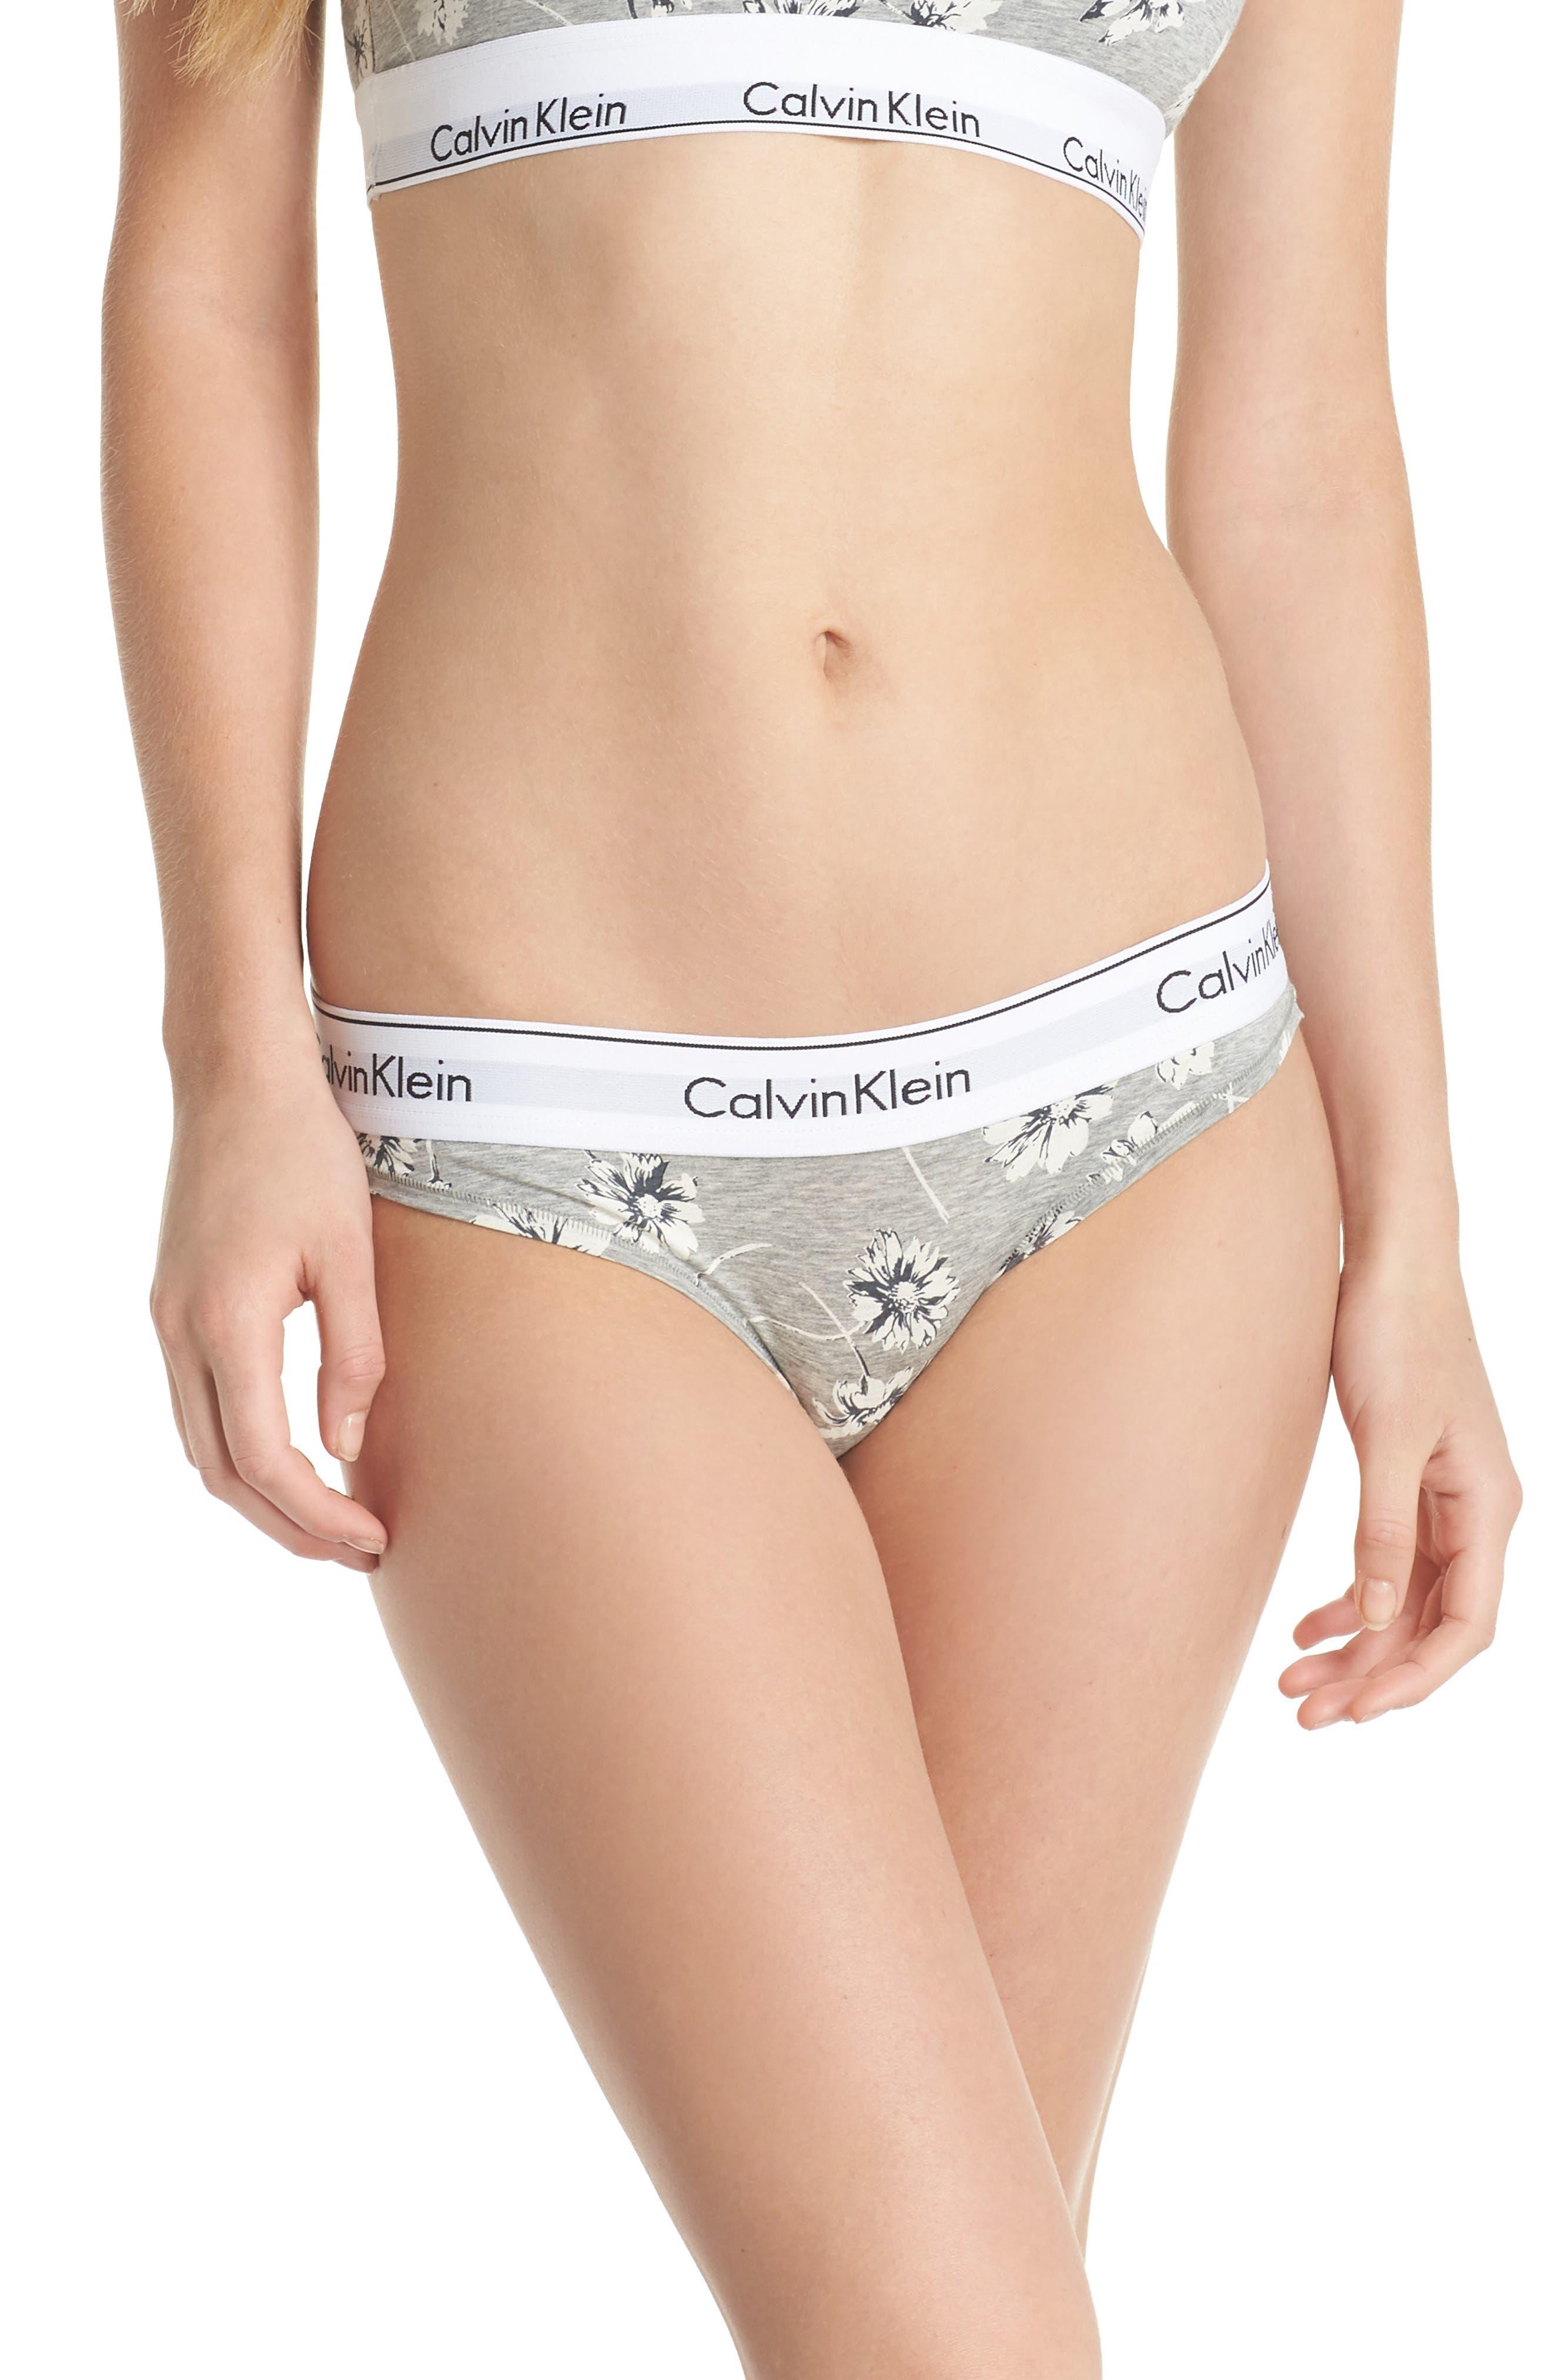 Calvin Klein 'Modern Cotton Collection' Cotton Blend Bikini